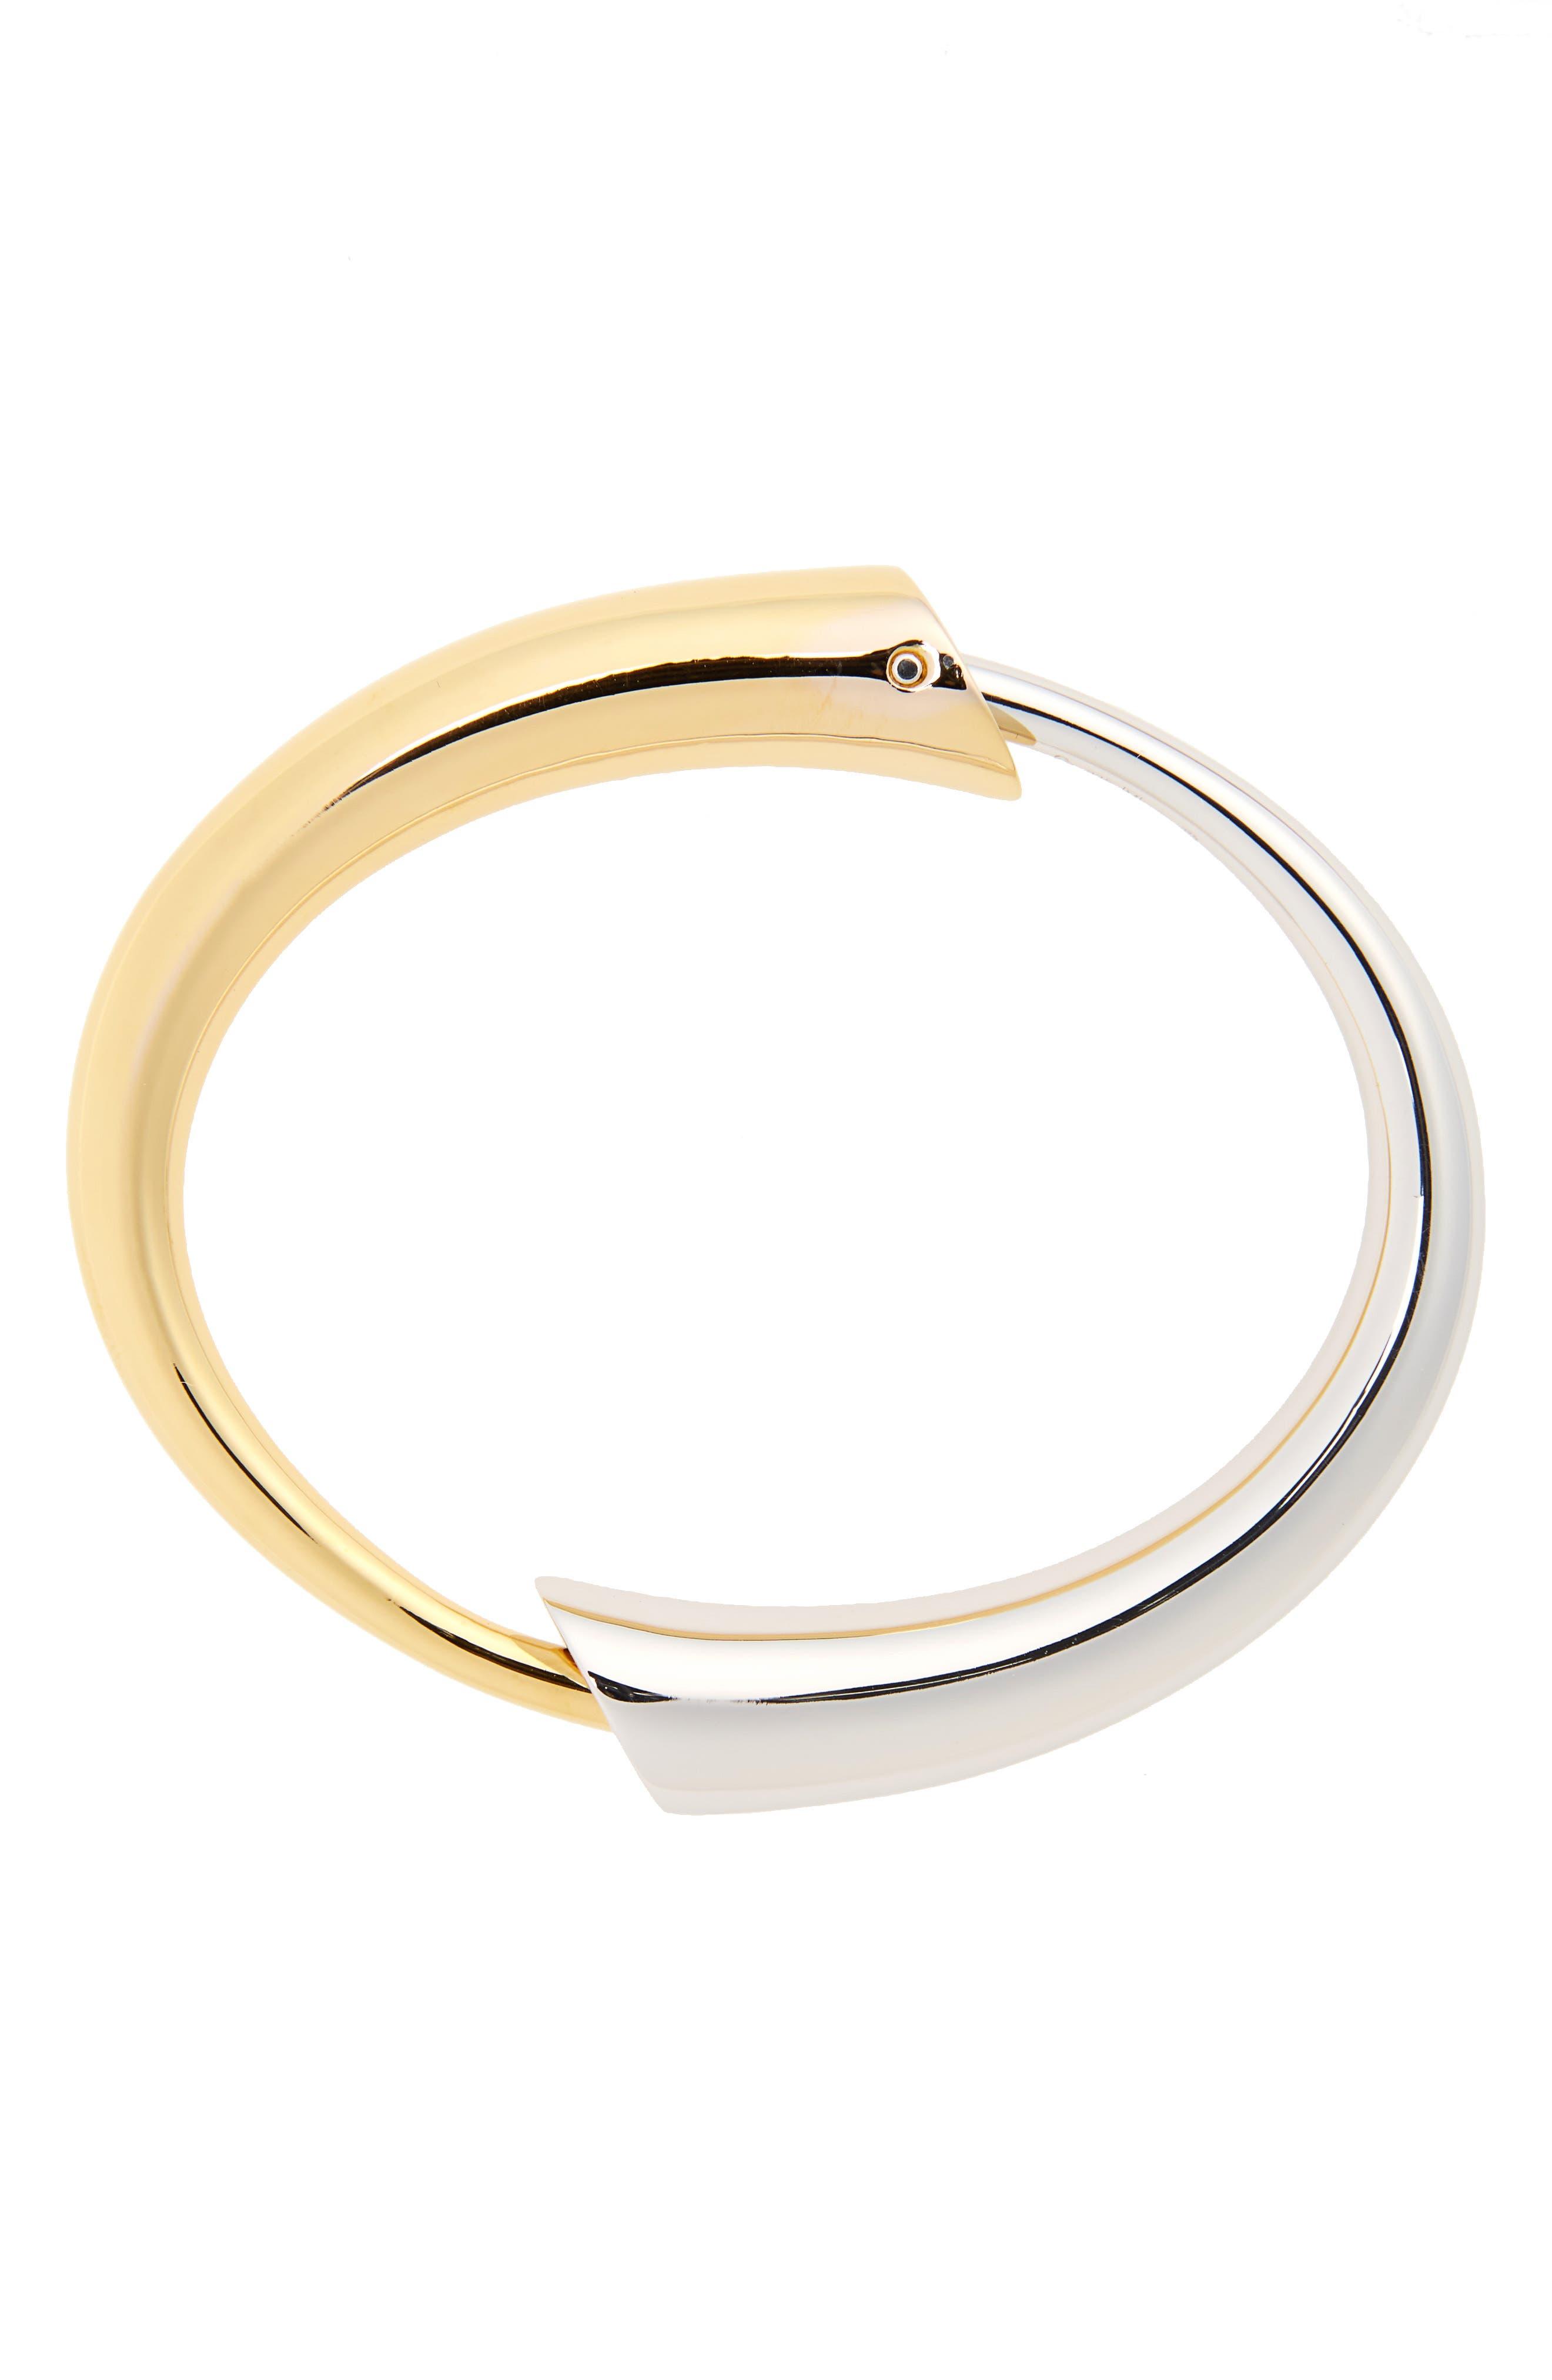 Gia Bracelet,                         Main,                         color, Yellow/Vermeil/Silver